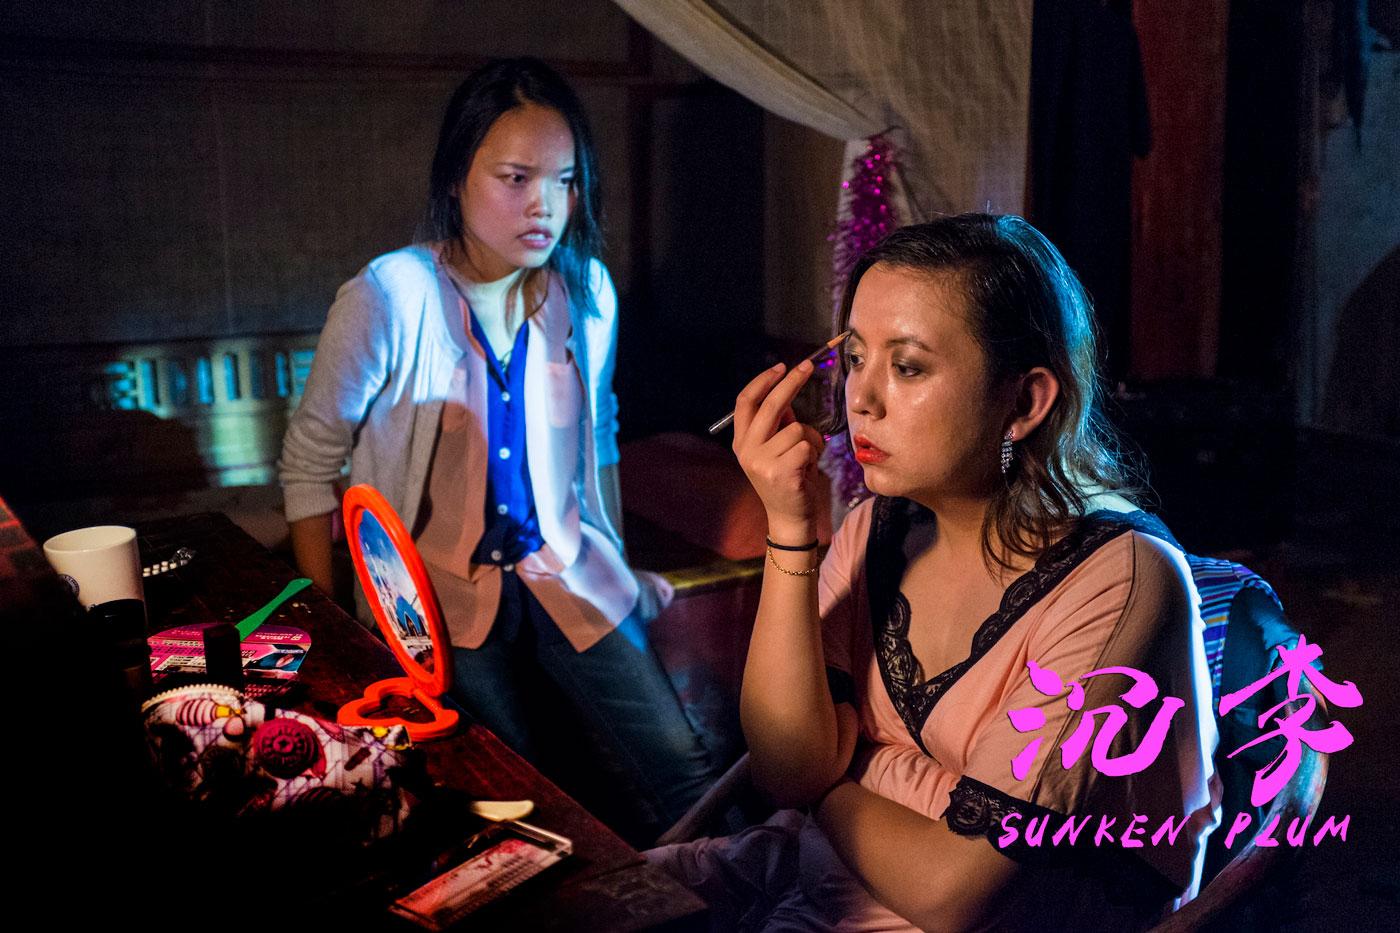 Sunken Plum - Transforming Cinema